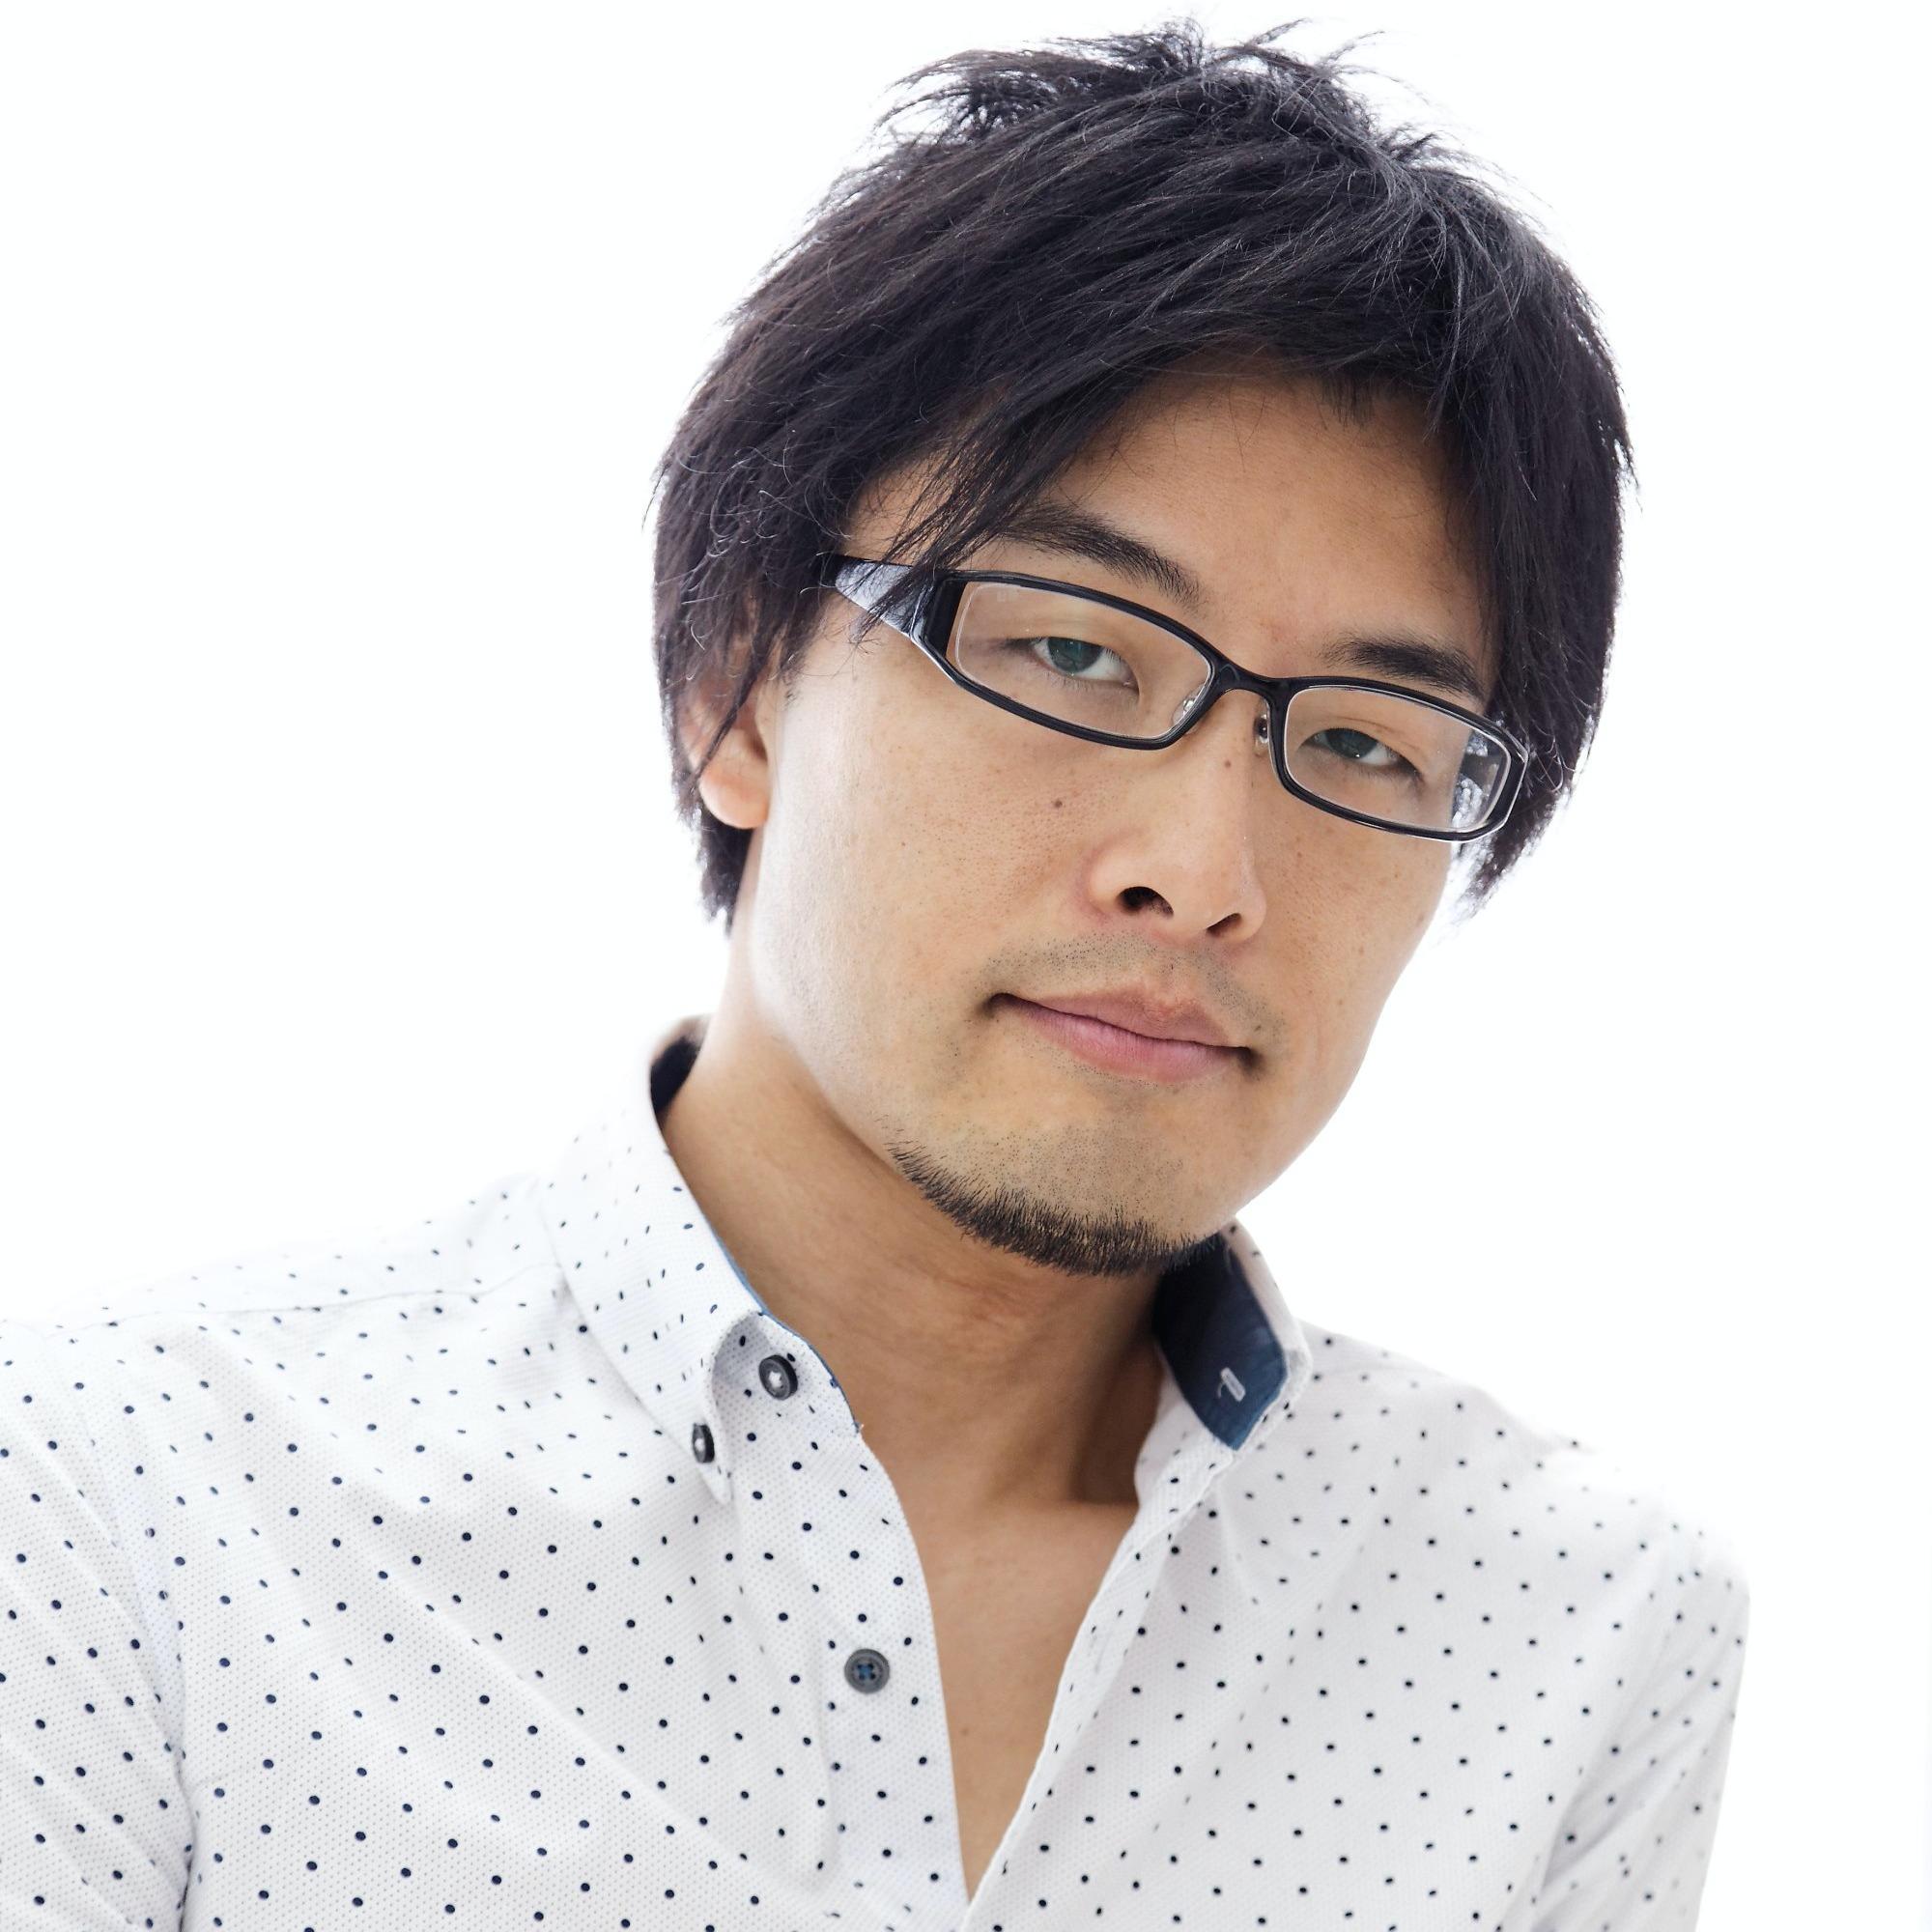 iwasa_5-small_resize